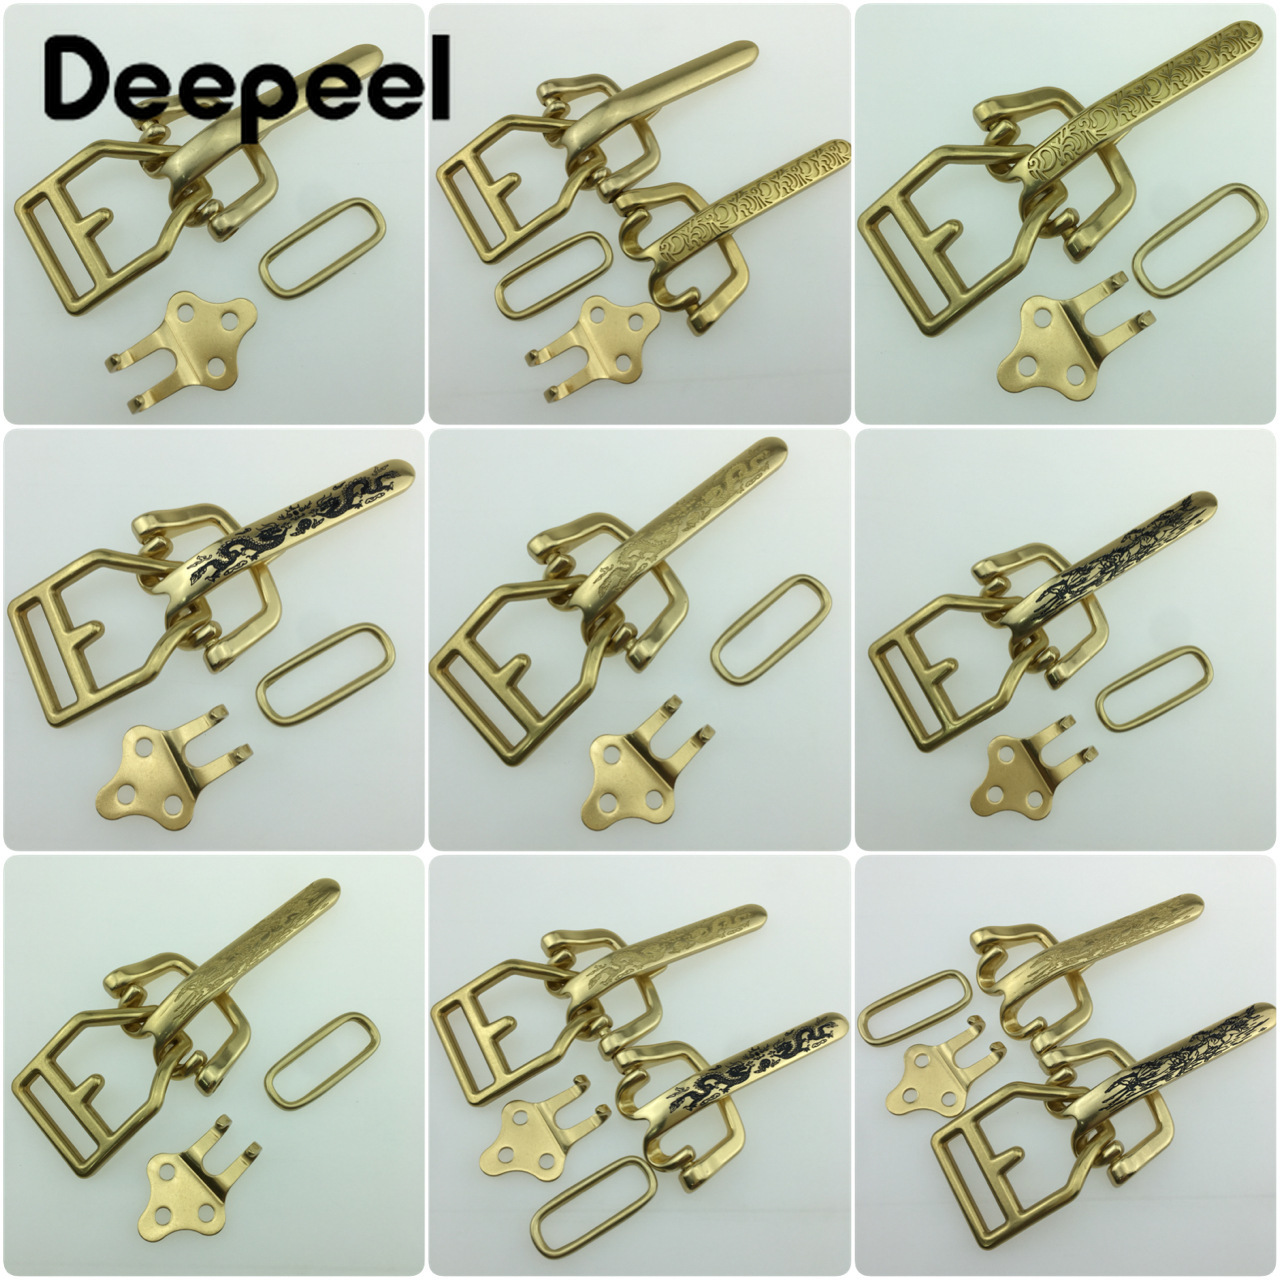 Deepeel 1Set=4pcs 40mm Solid Brass Belt Buckles For Men DIY Waistband Jeans Leather Craft For 38mm Belt Accessories YK168